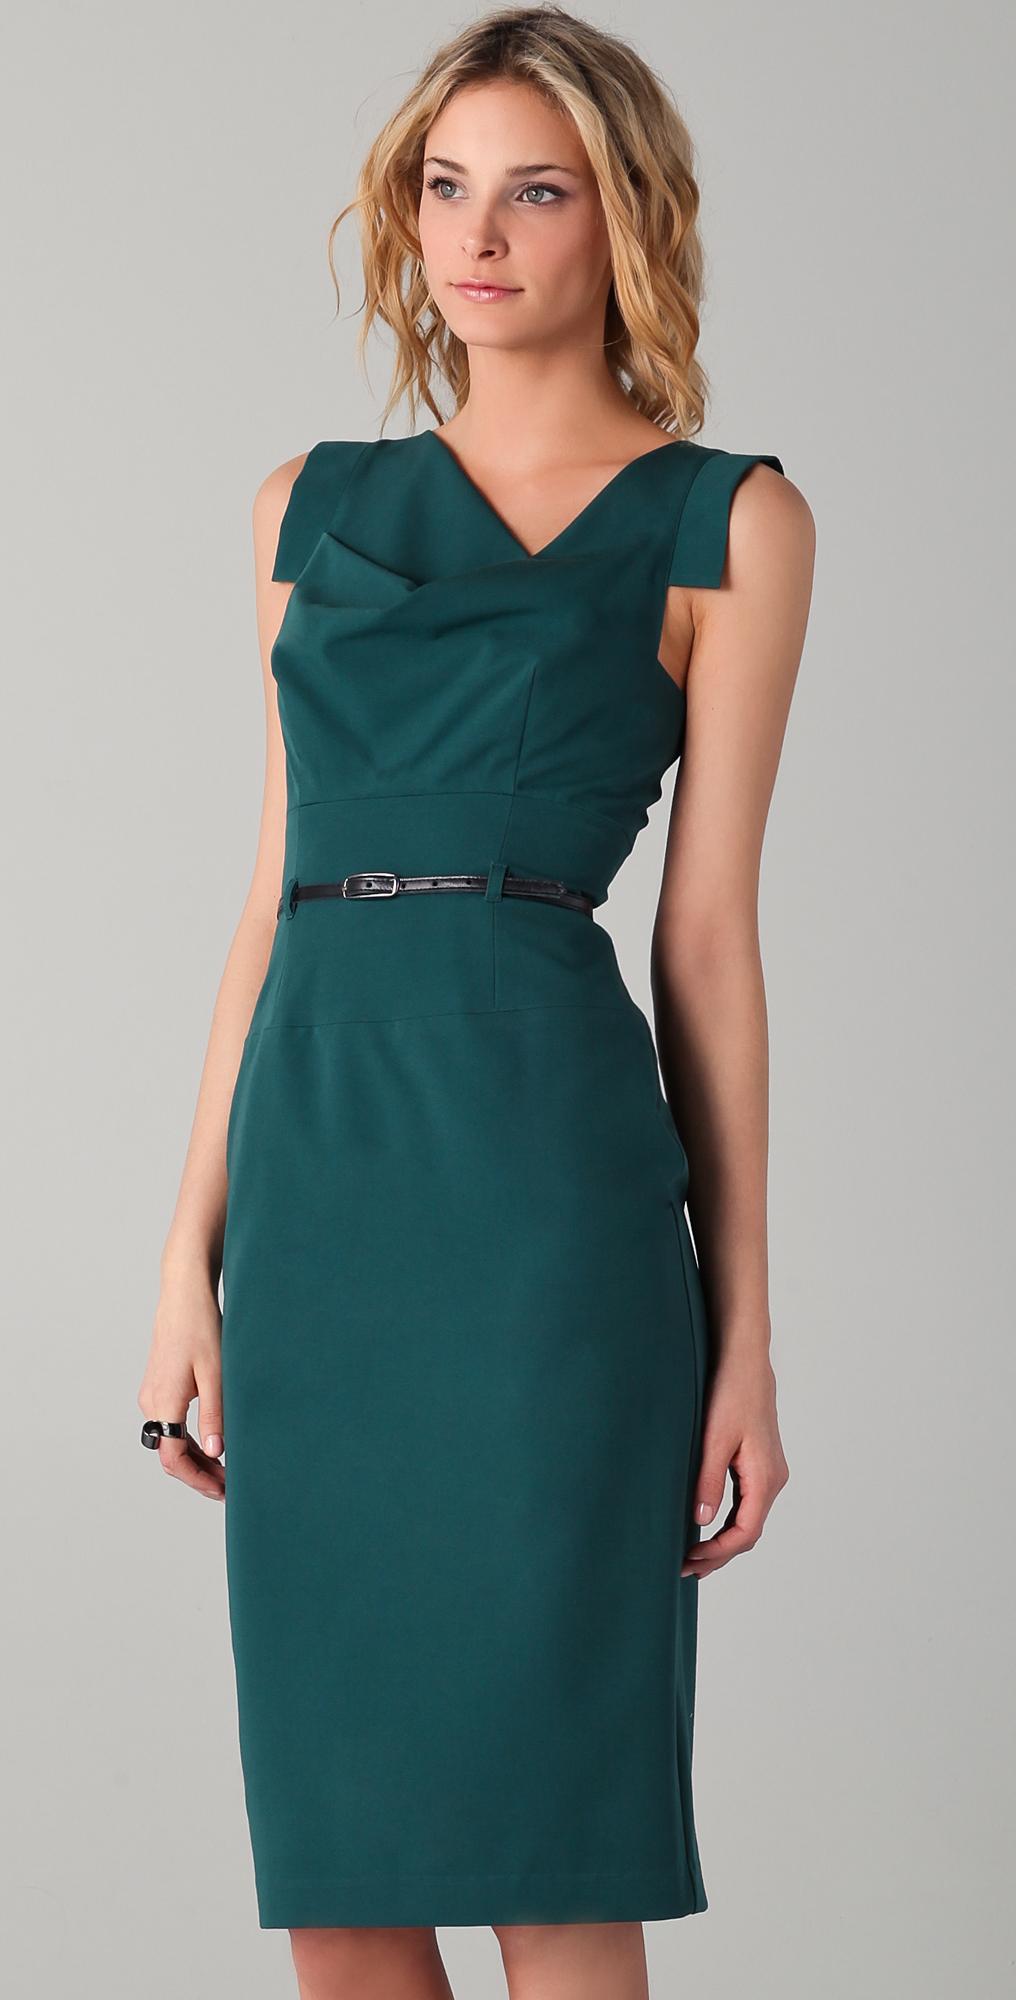 Black Halo Jackie O Belted Midi Dress | SHOPBOP